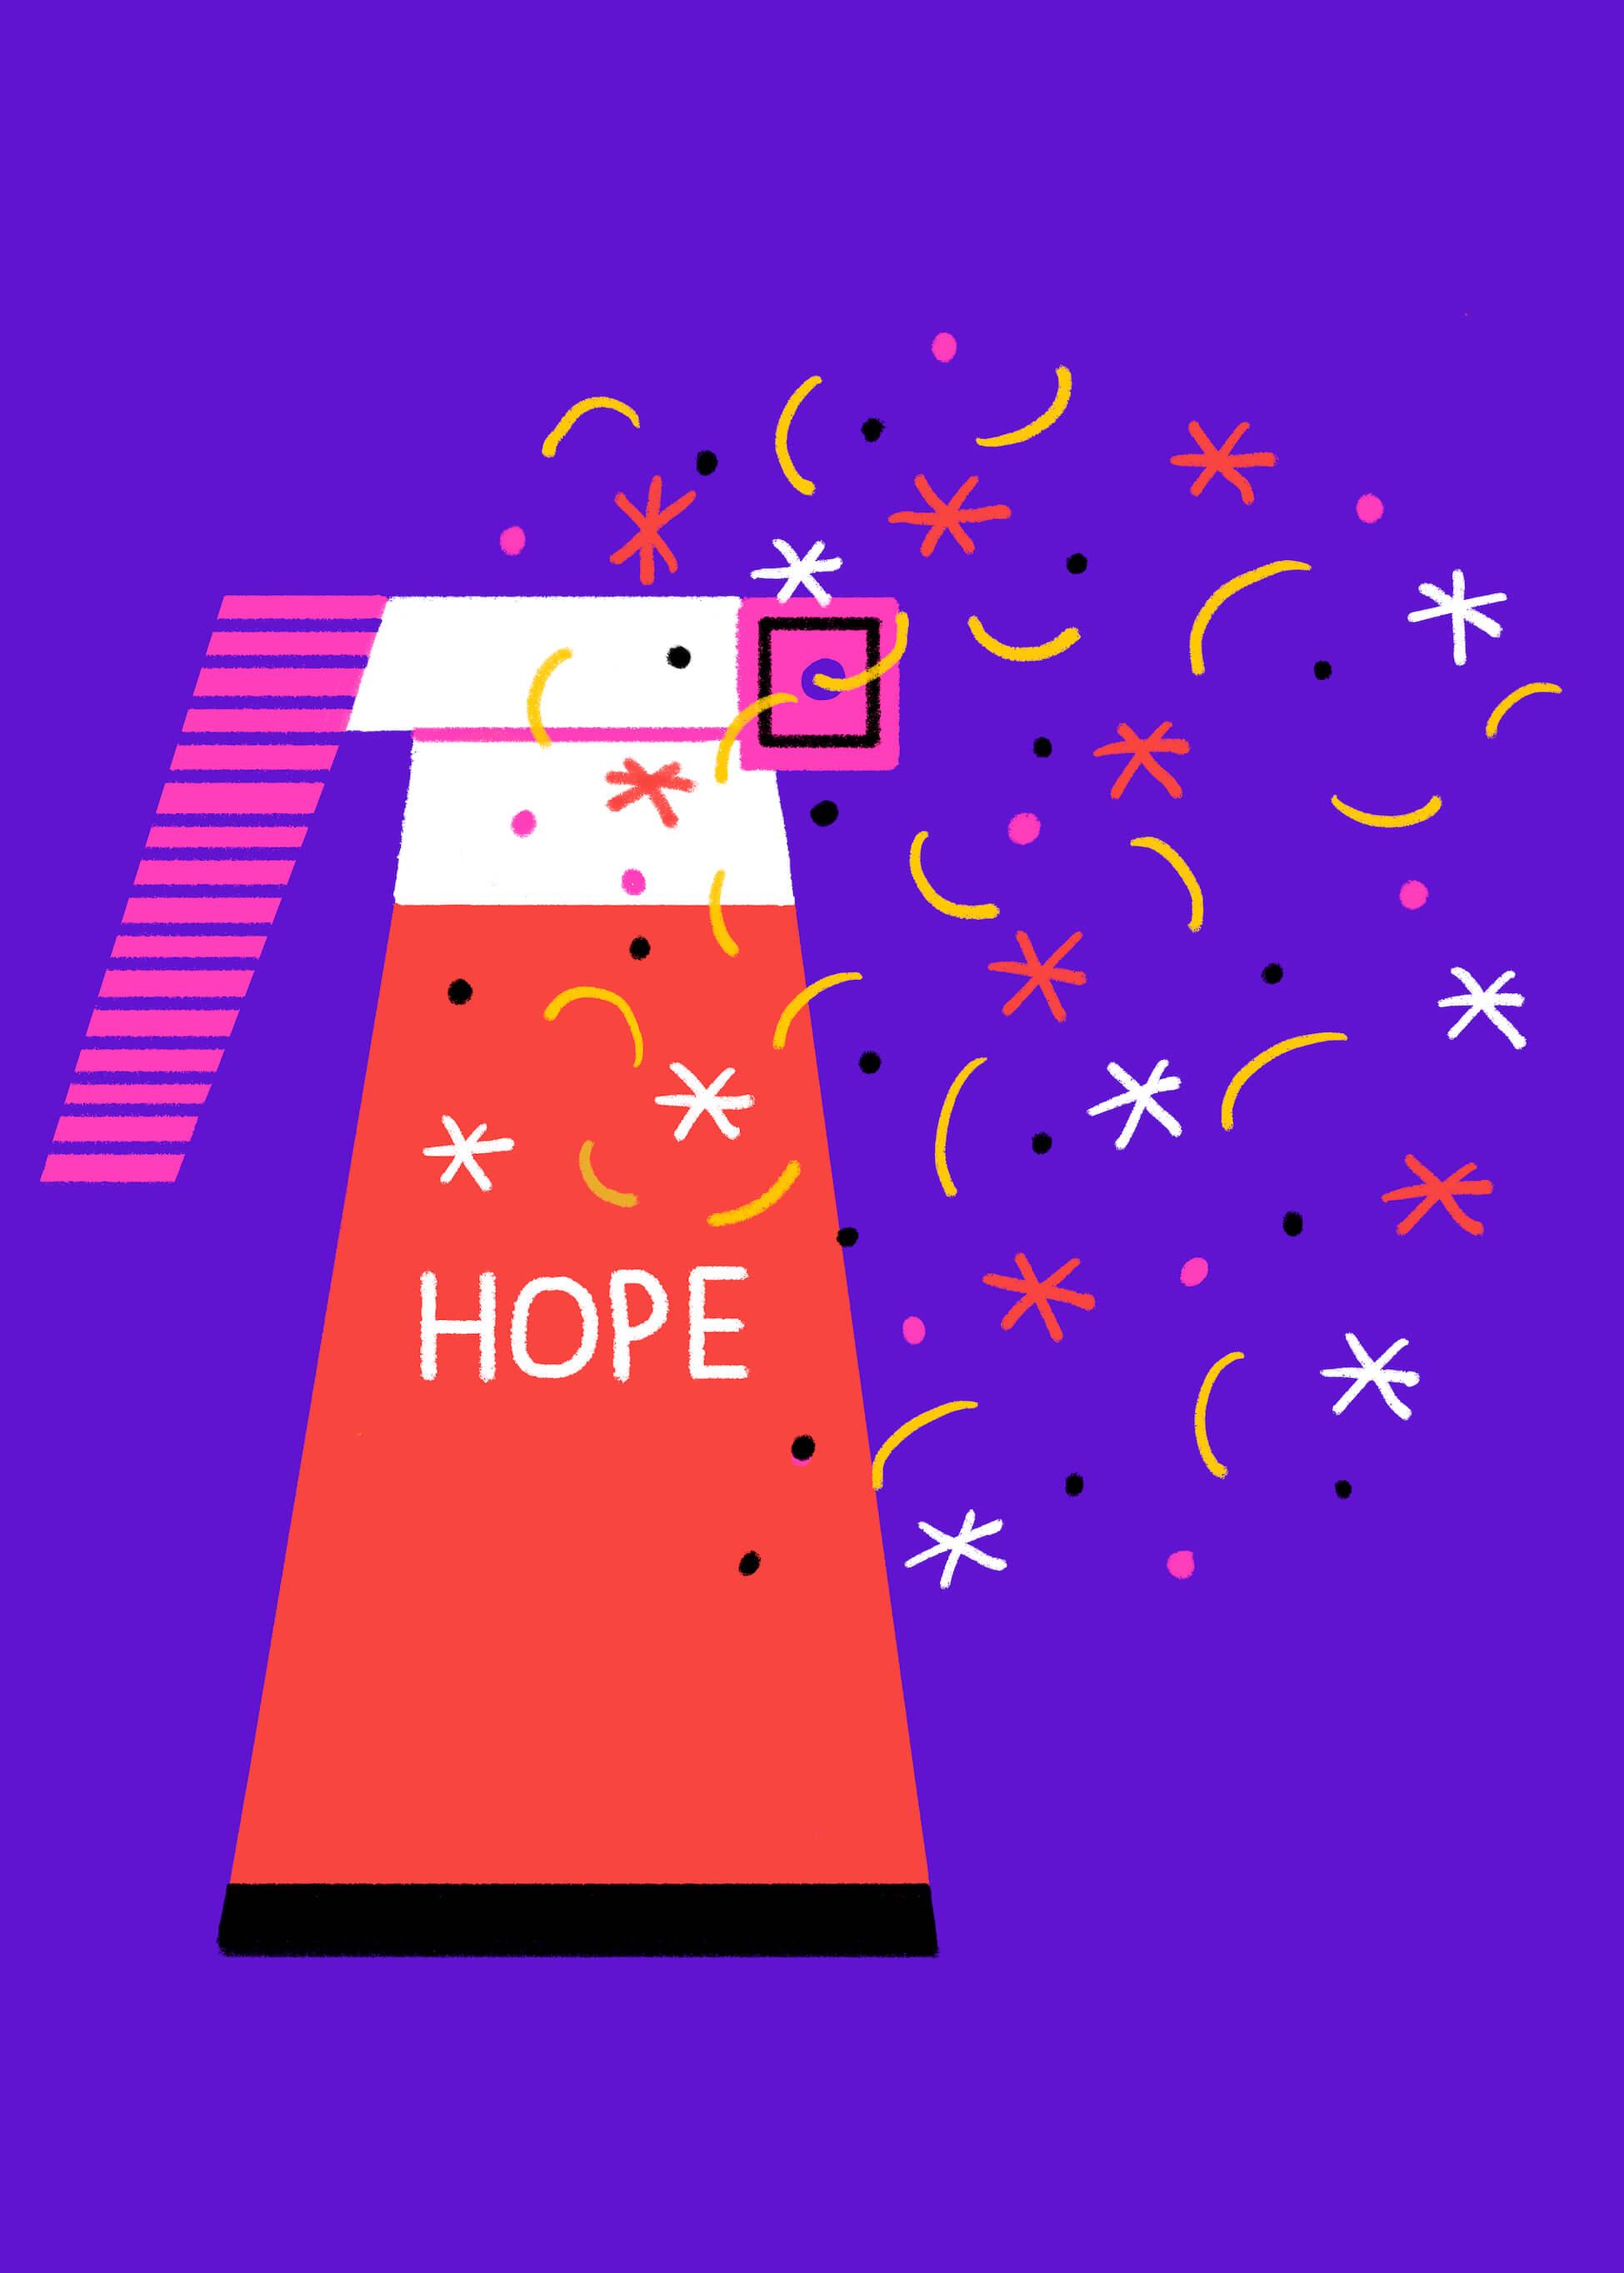 Hope main image